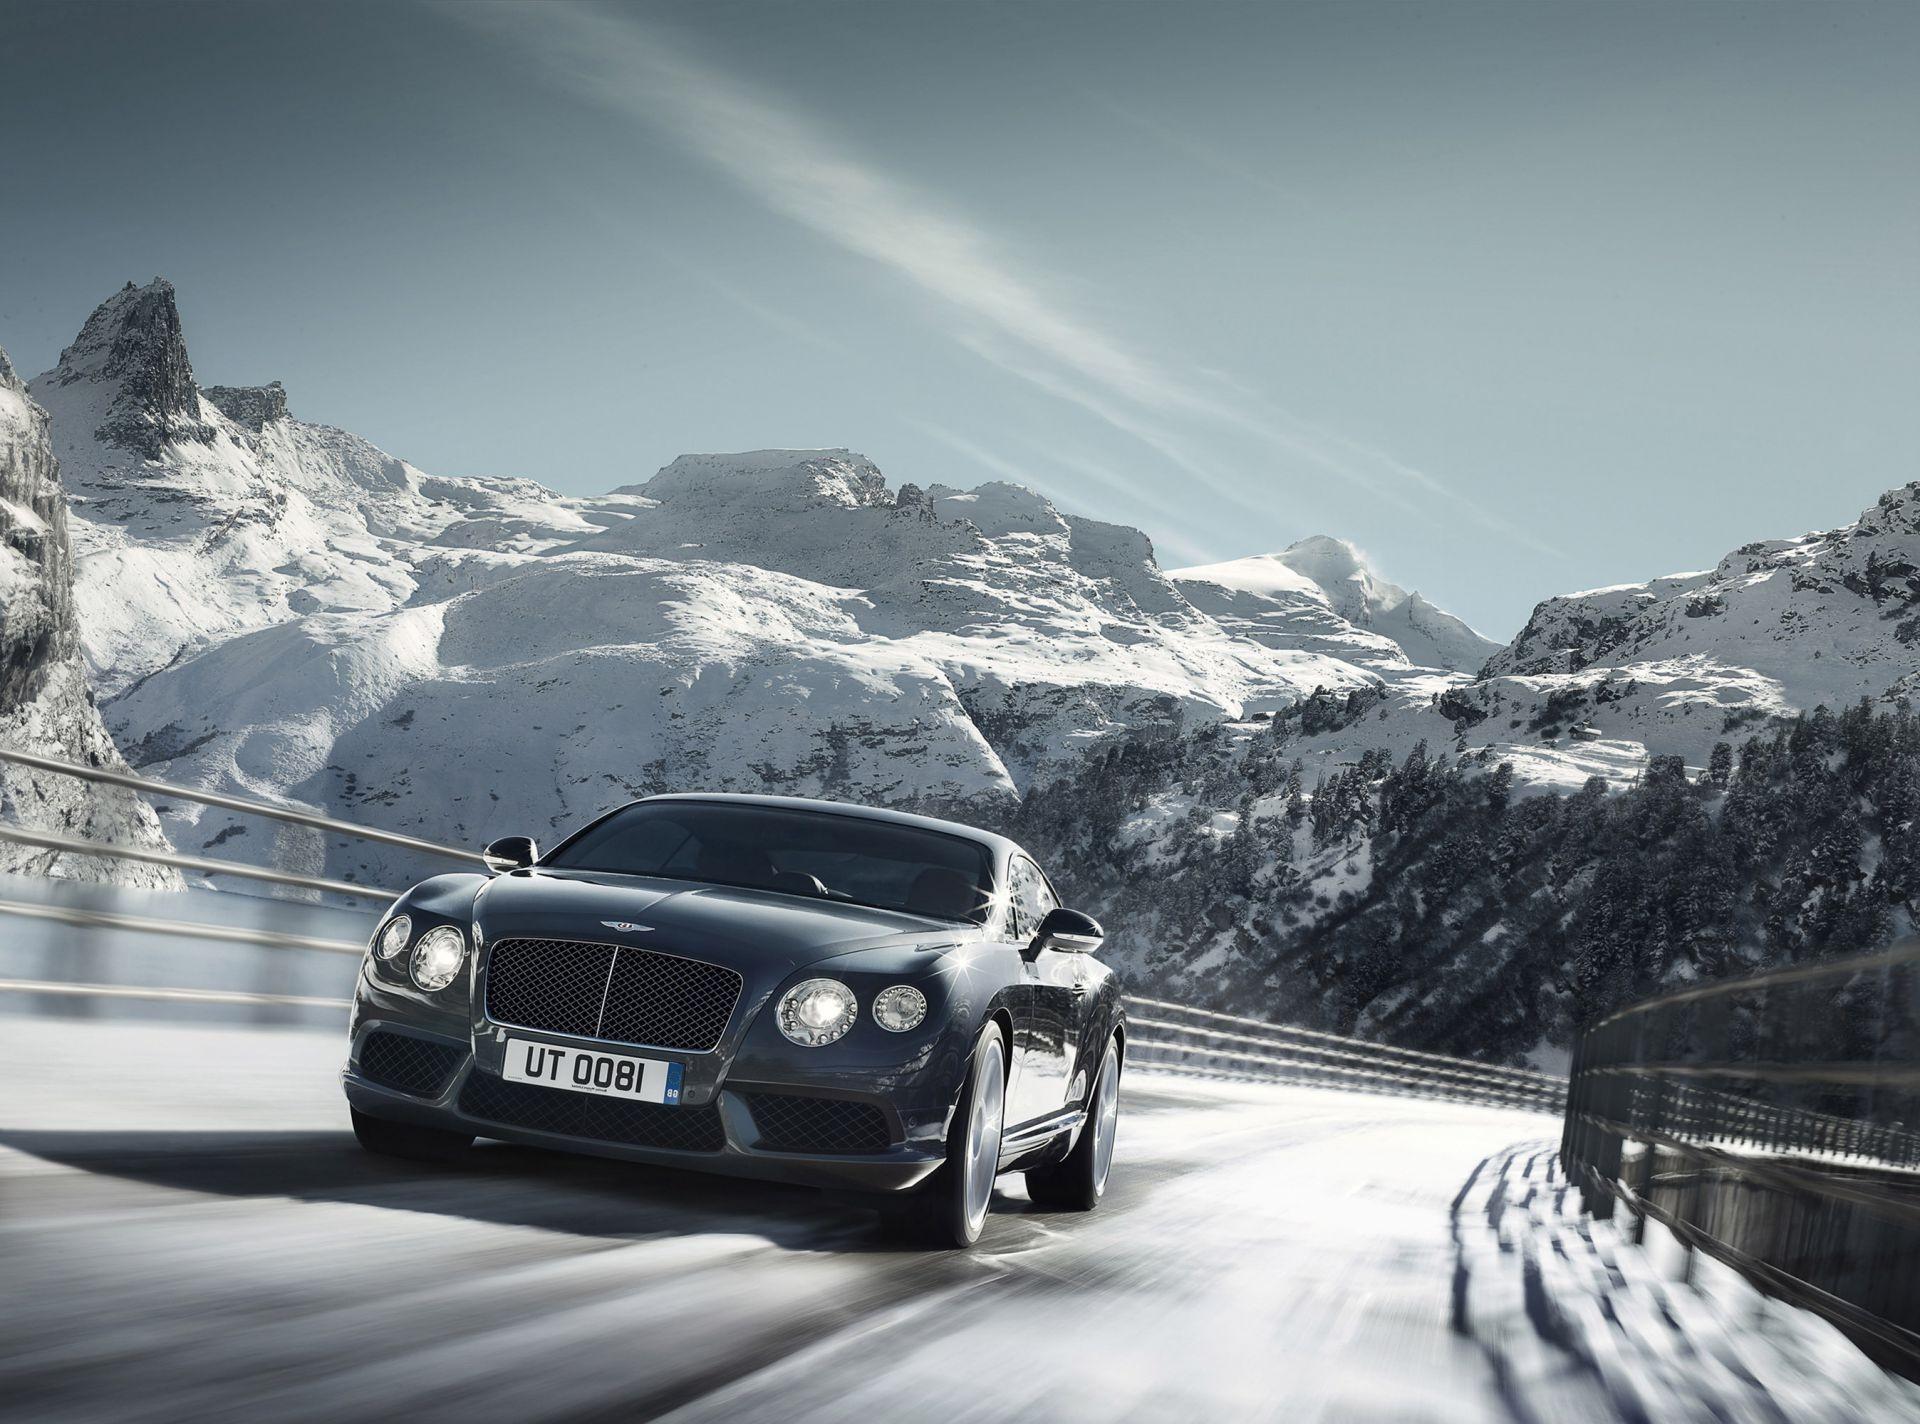 Машина природа горы снег 2012 Bentley Continental Gt V8